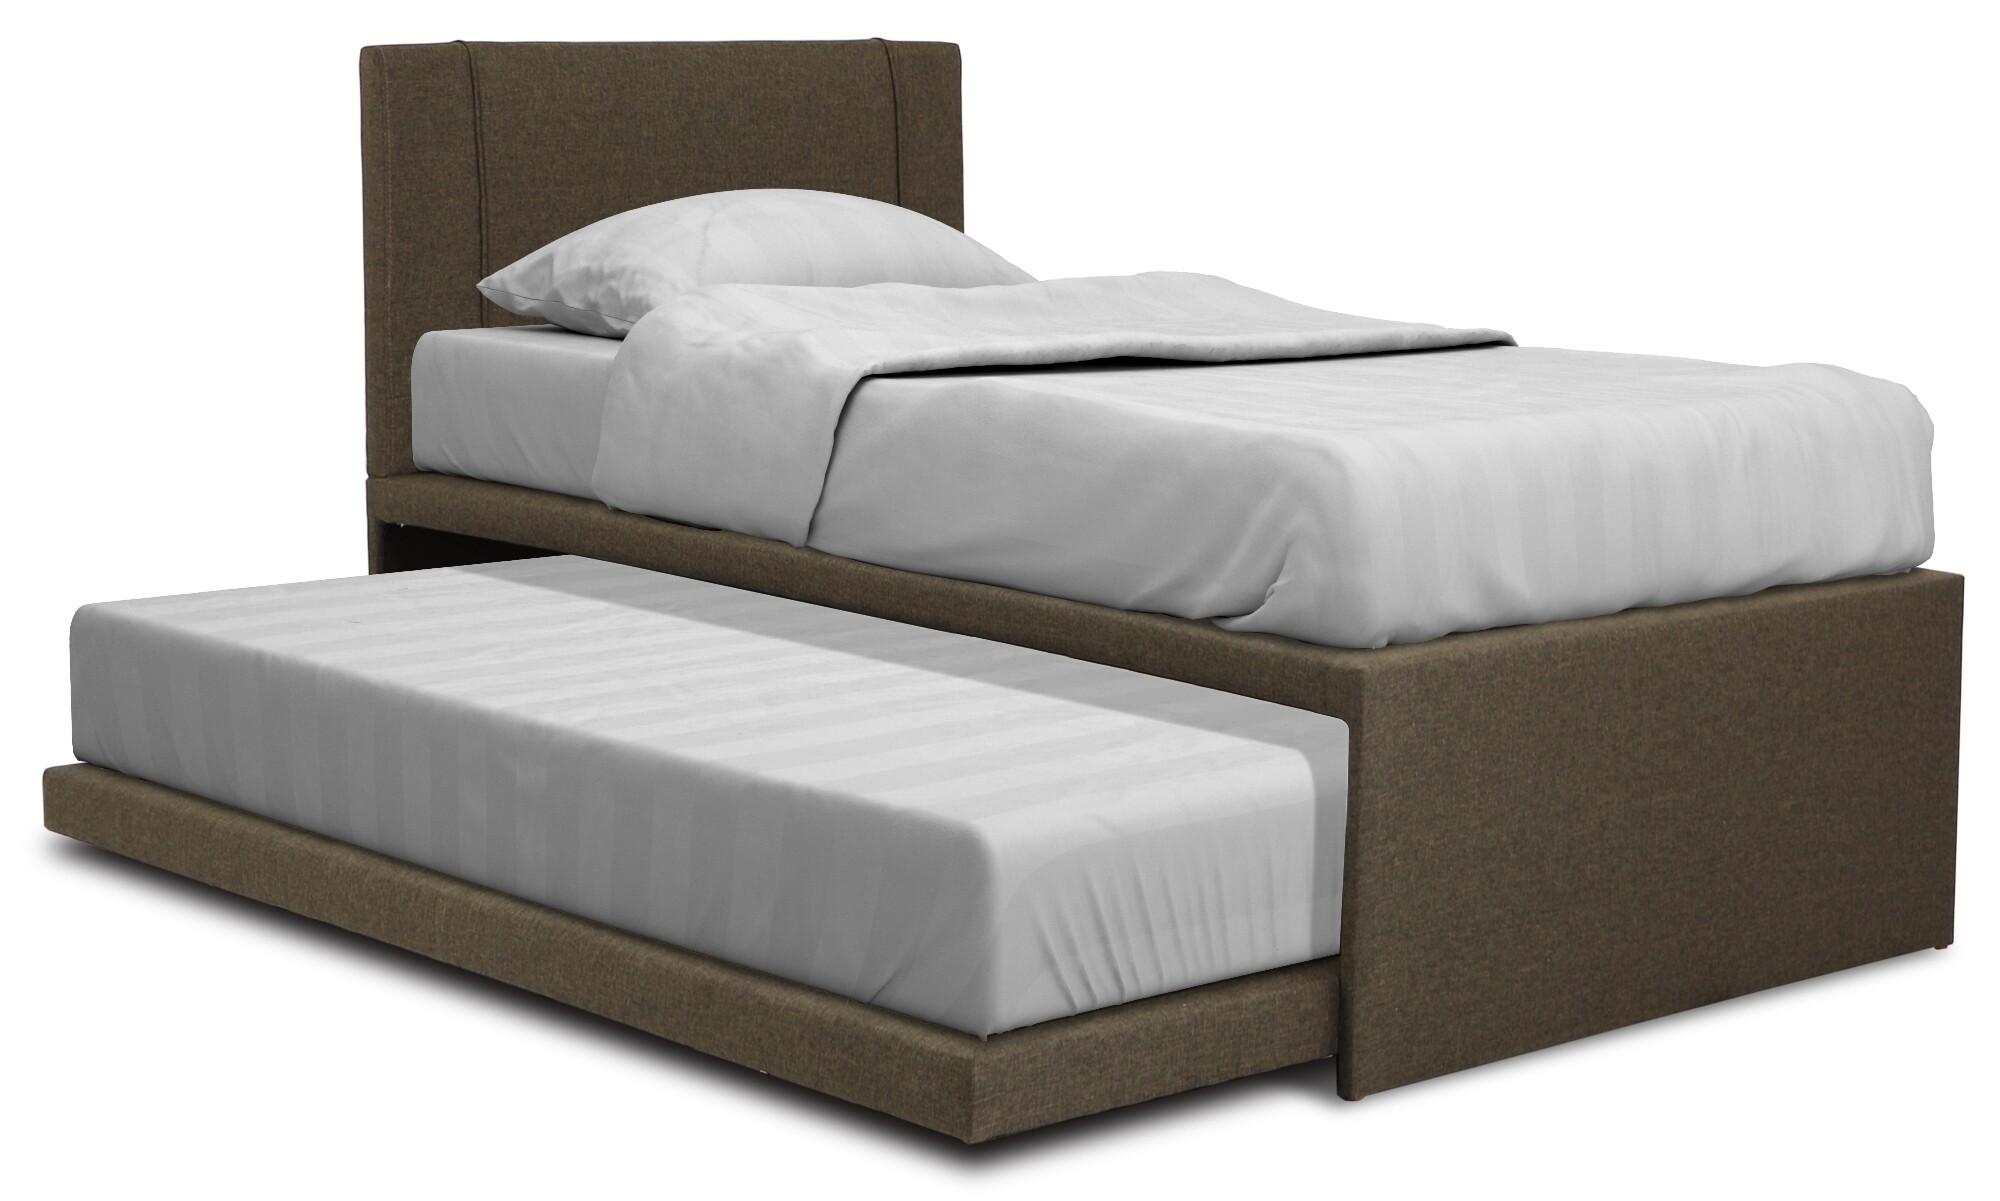 Single Size Mattress For Nayler Fabric Bedframe Solano Foam Mattress Package In Single Size